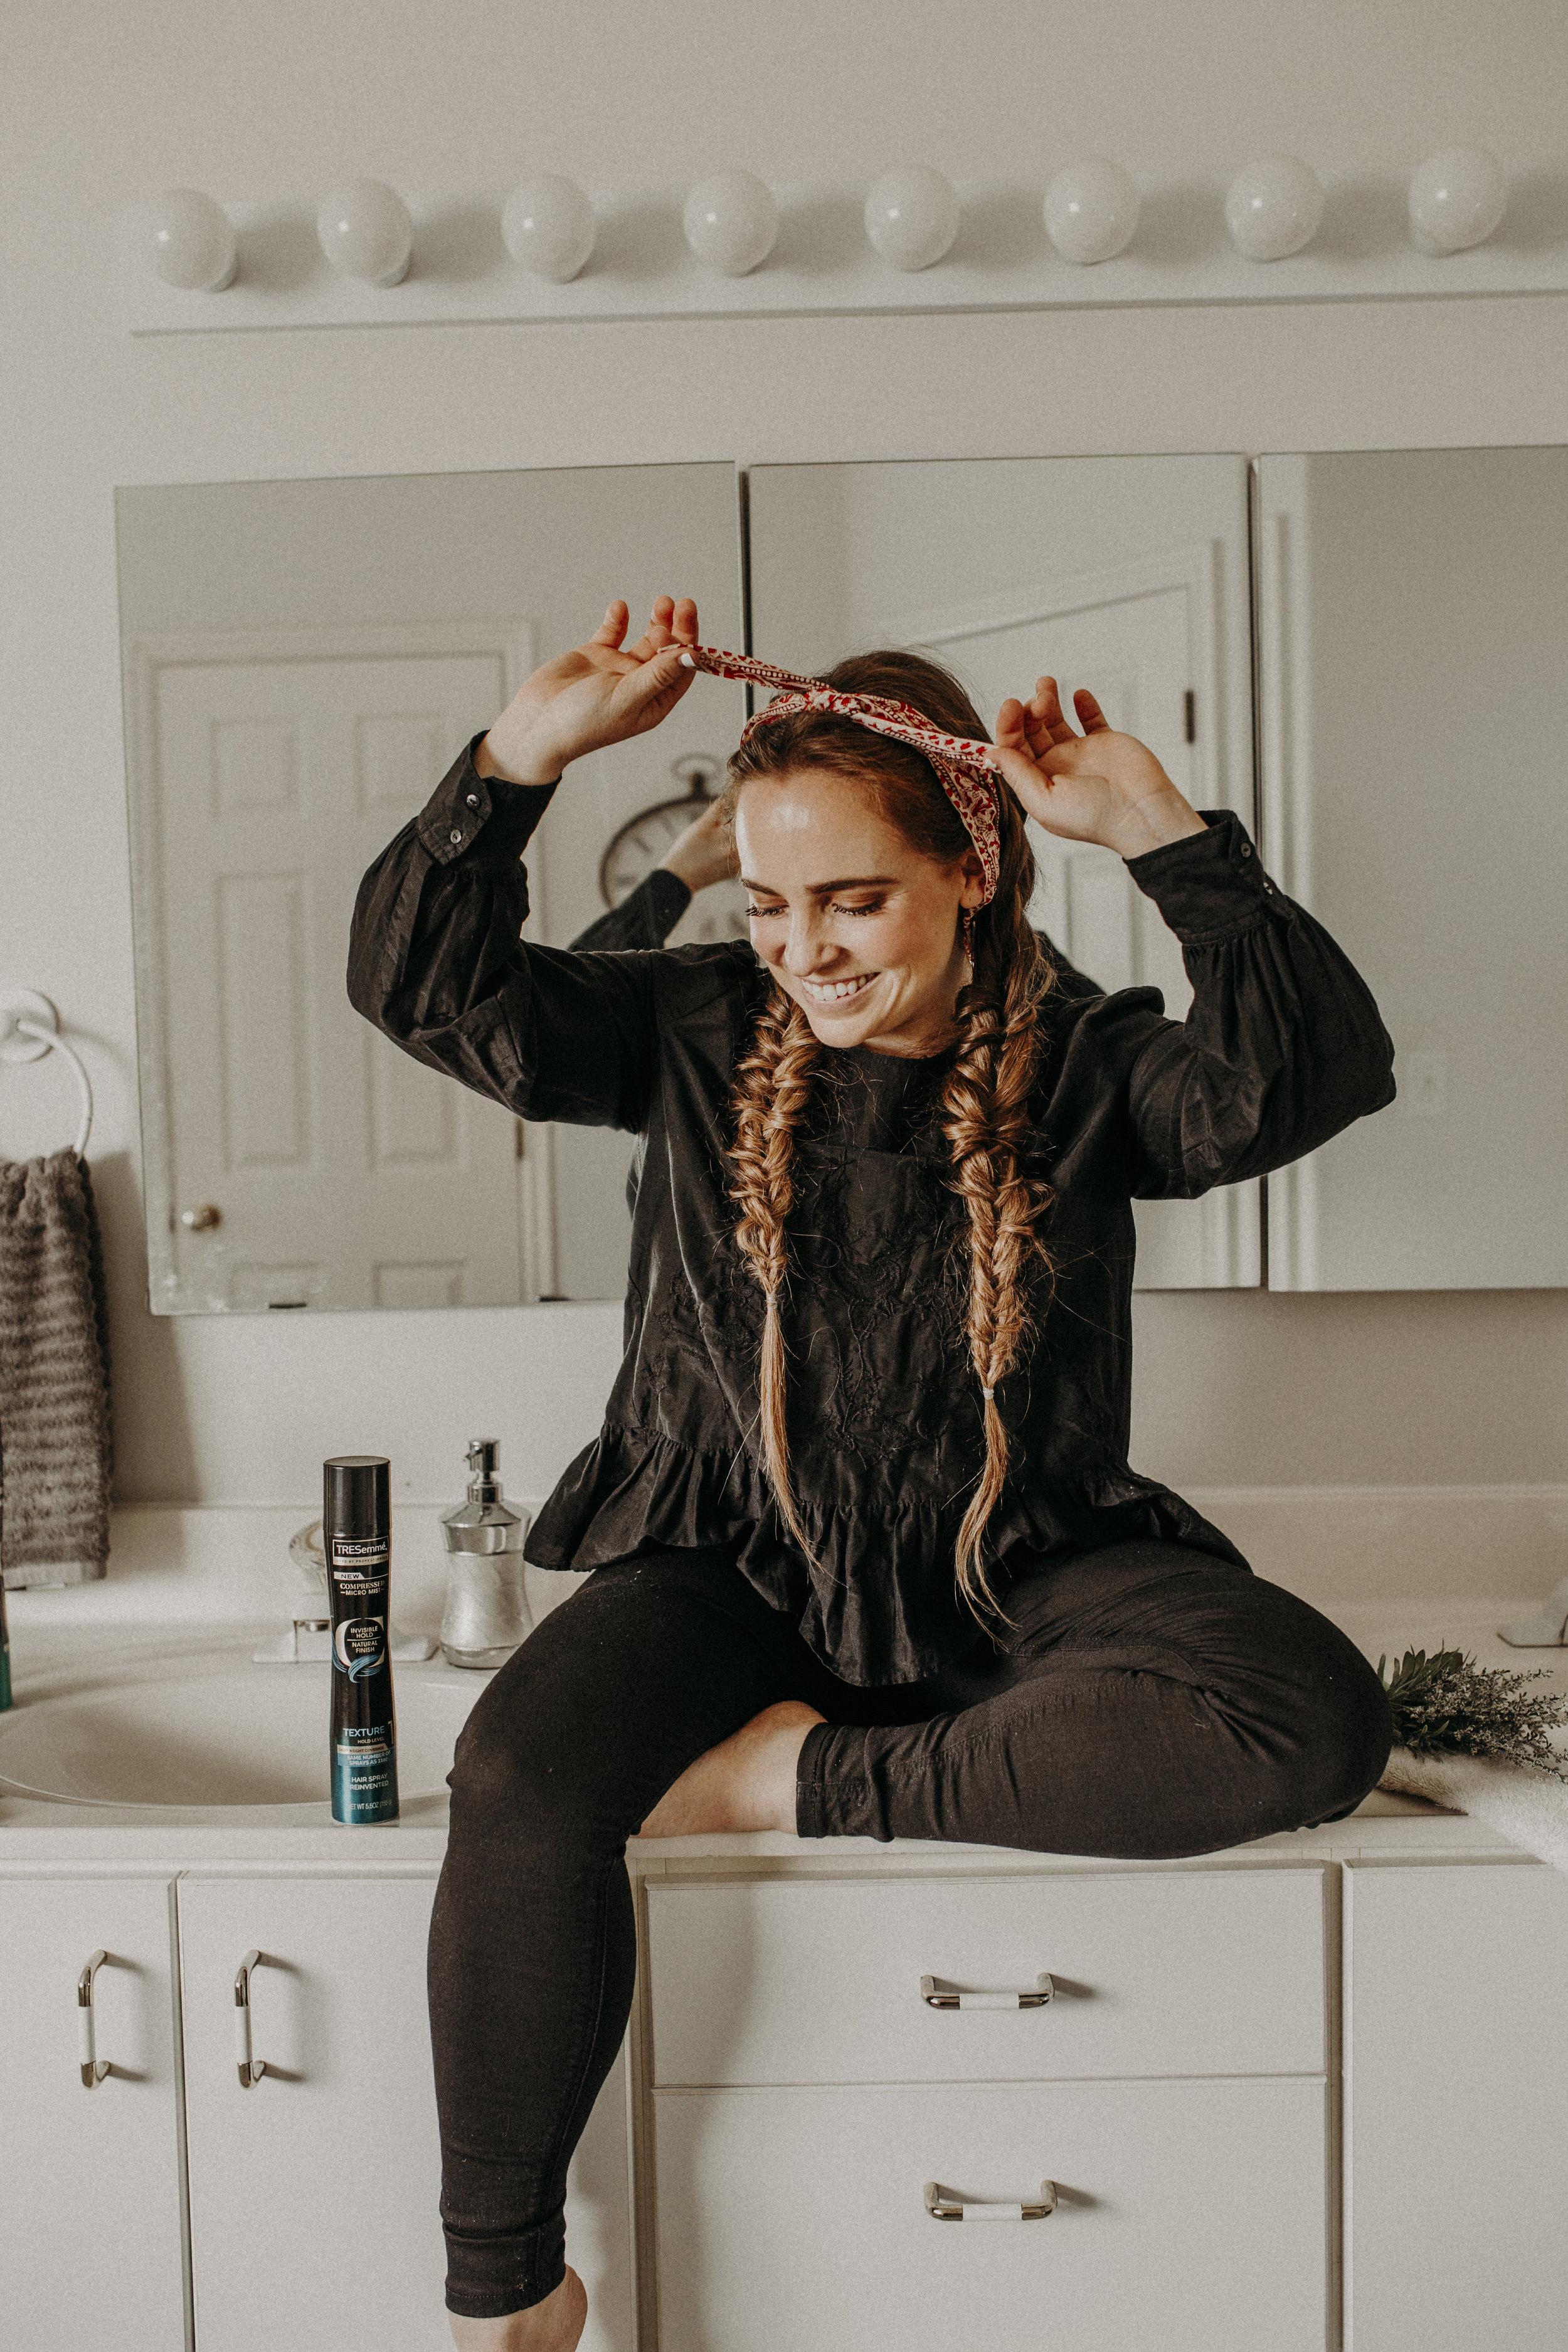 Tresseme-Micro-Mist-Hairspray-Review-Infinity-Braid-Tutorial-36.jpg